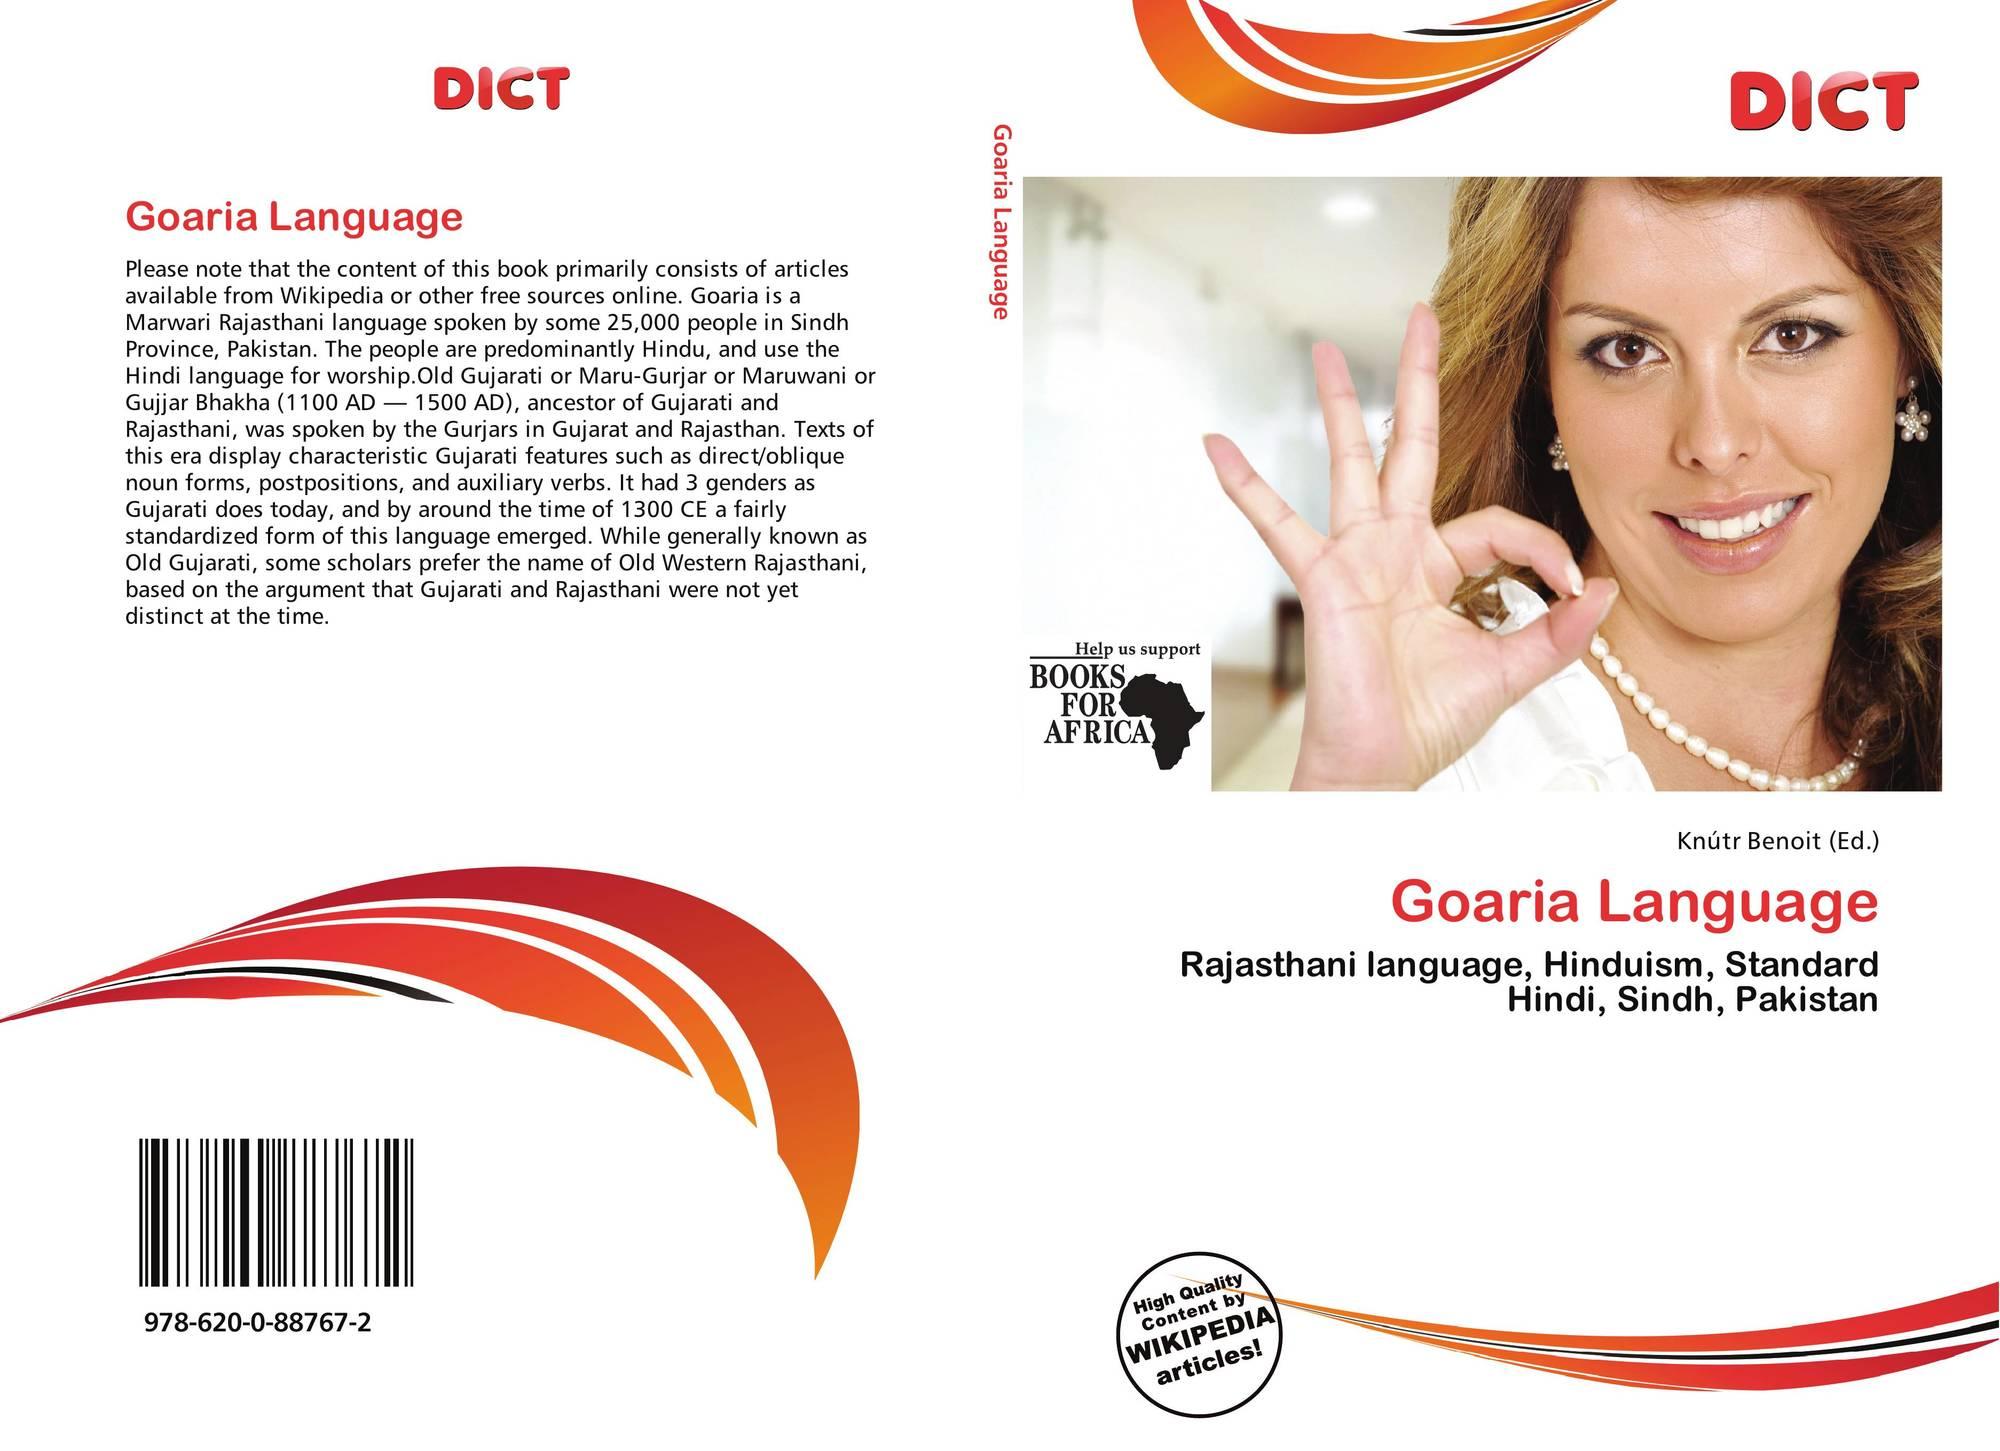 Goaria language